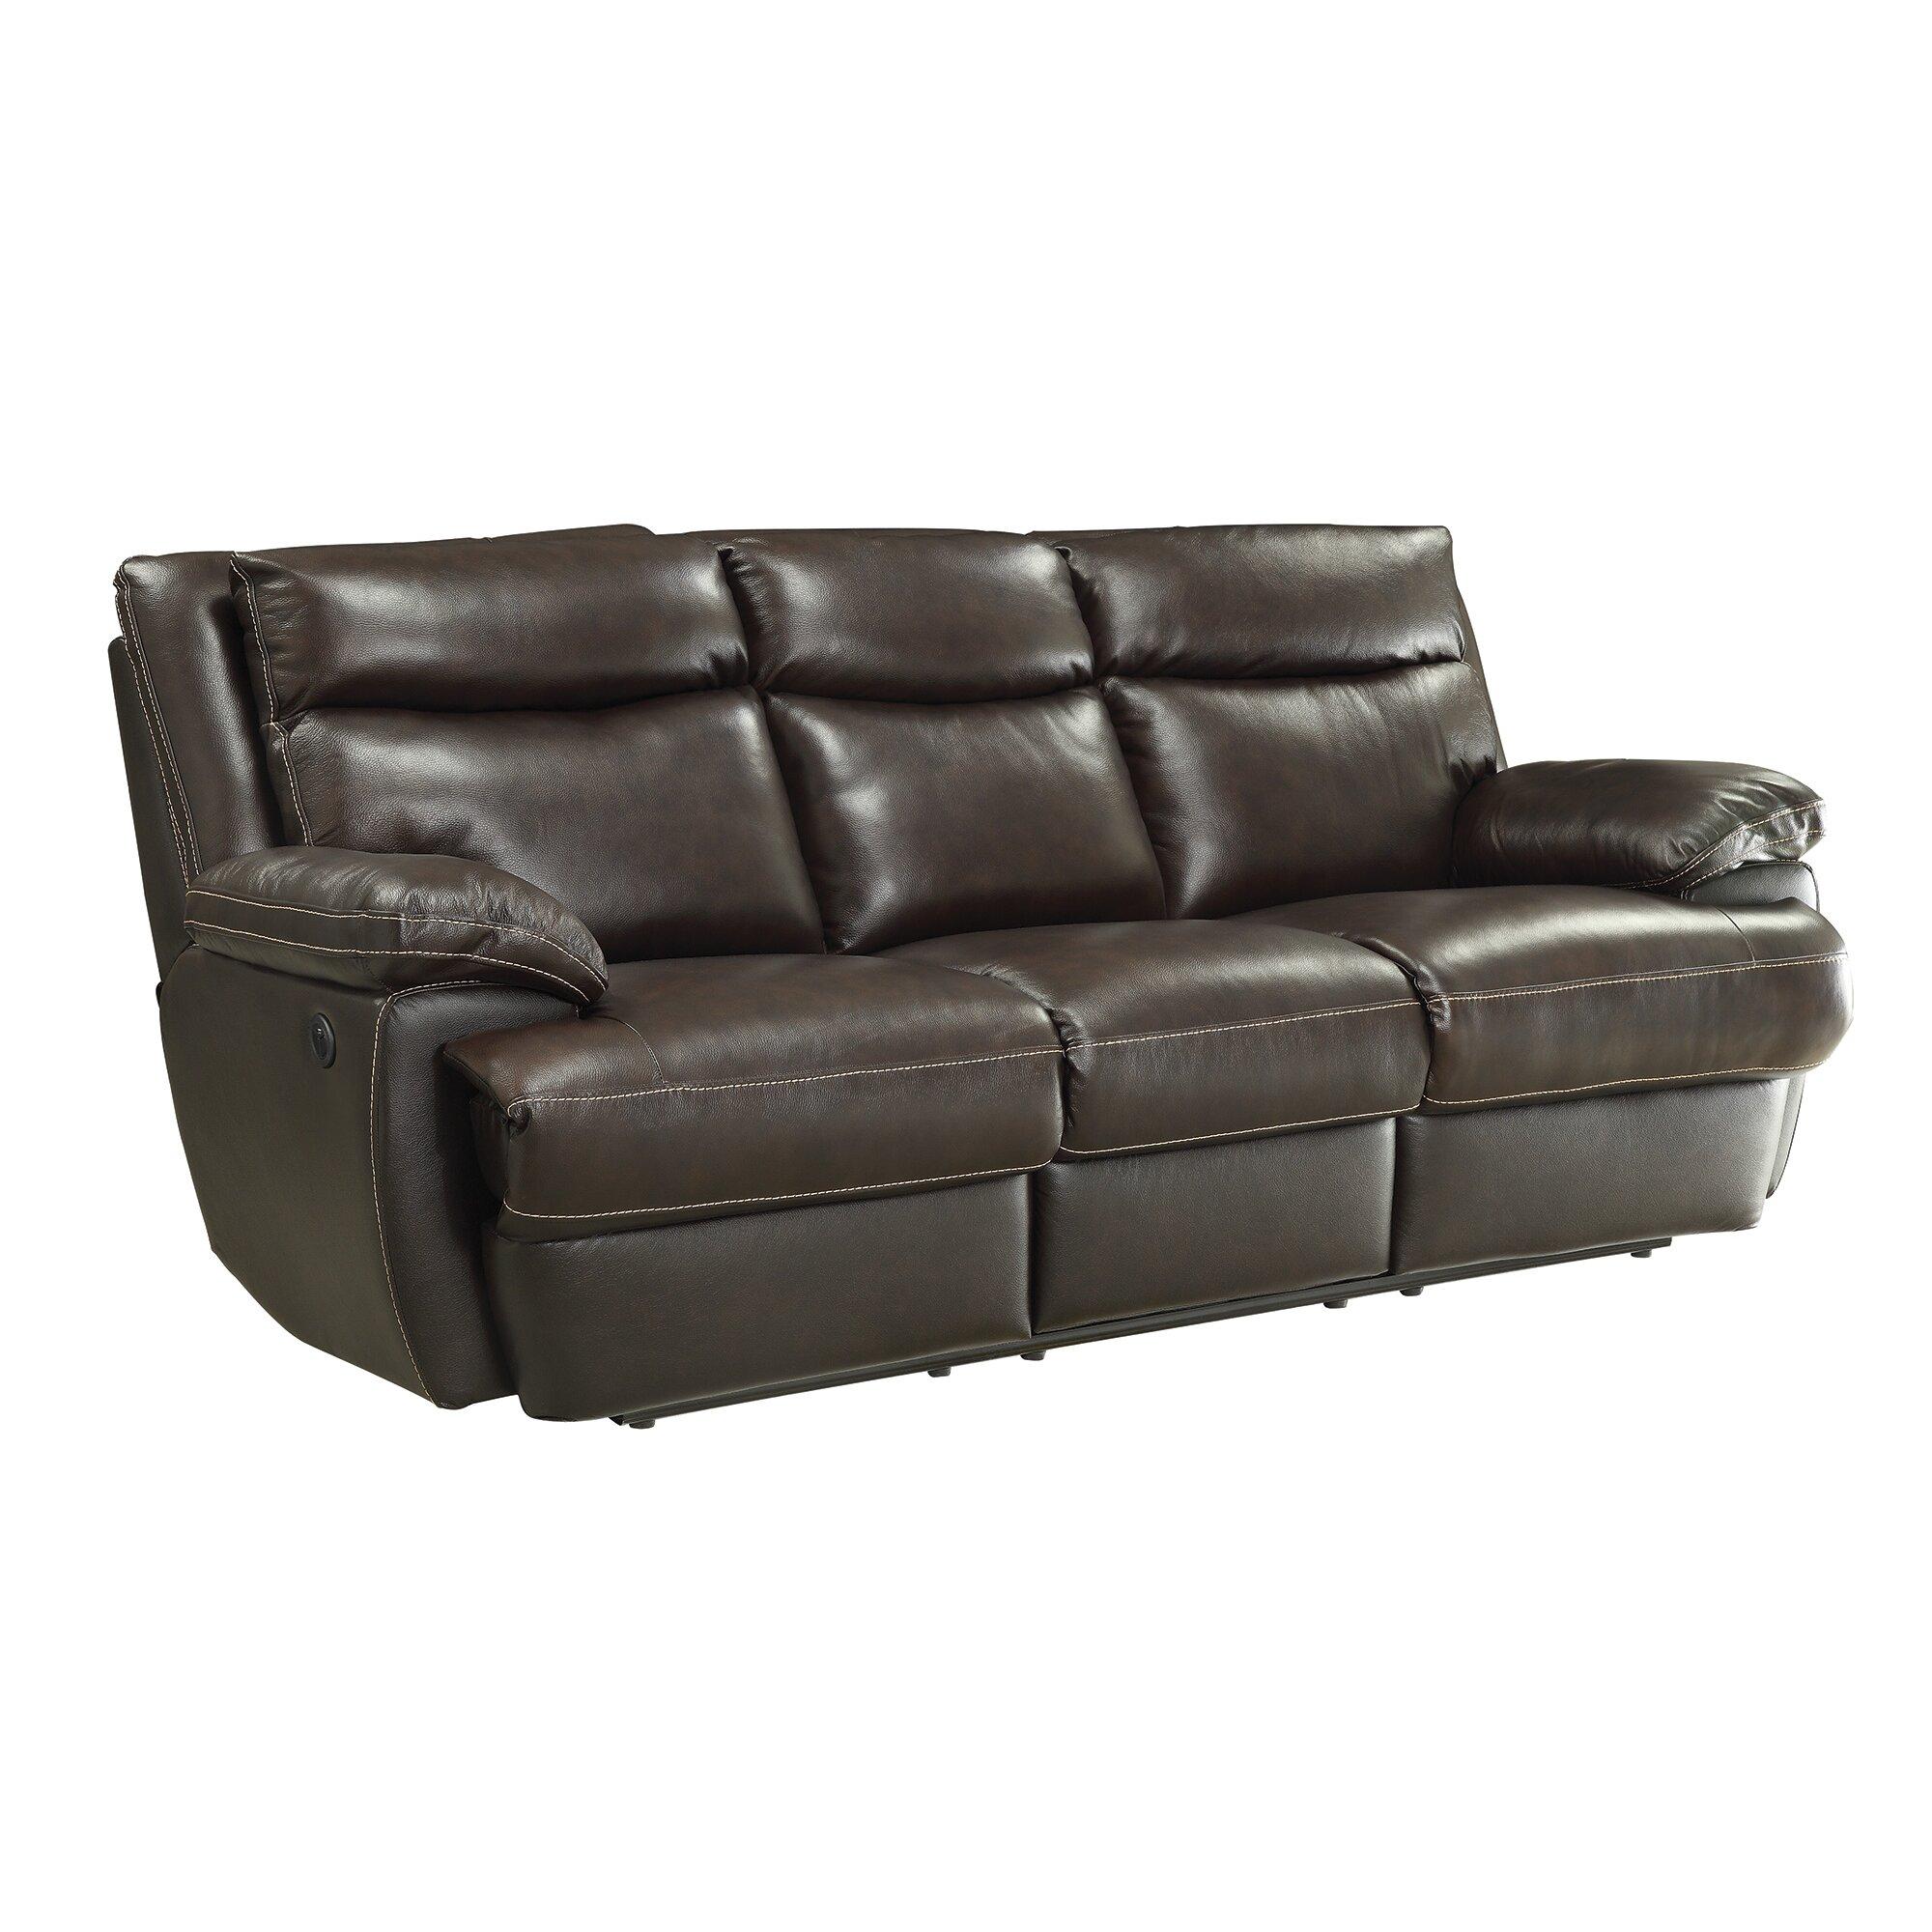 MacPherson Power Leather Reclining Sofa